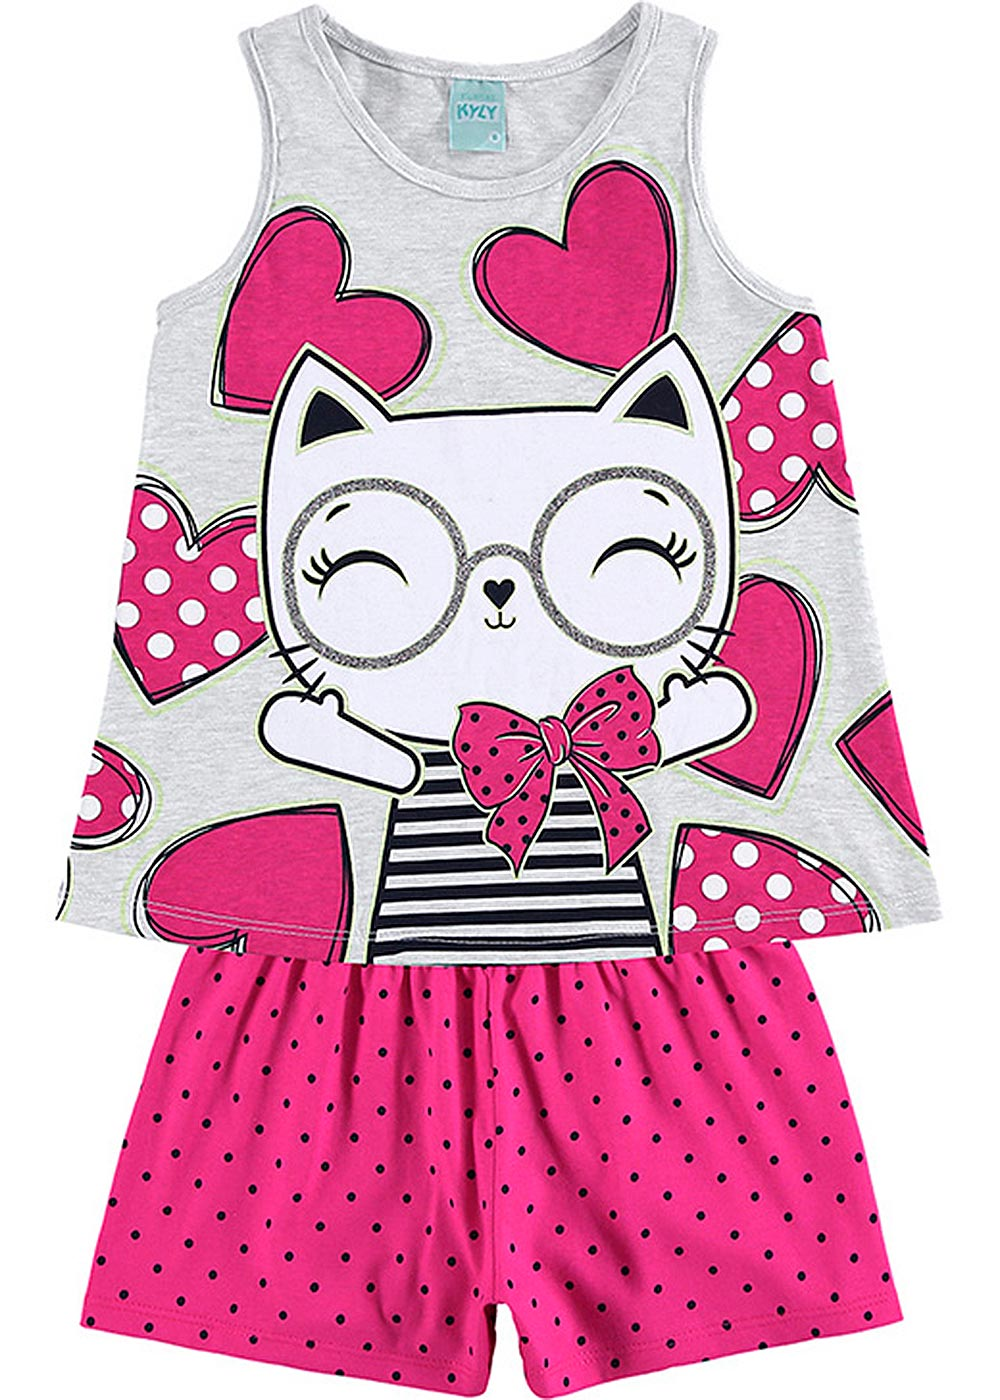 Pijama Infantil Feminino Verão Cinza Fashion Cat - Kyly